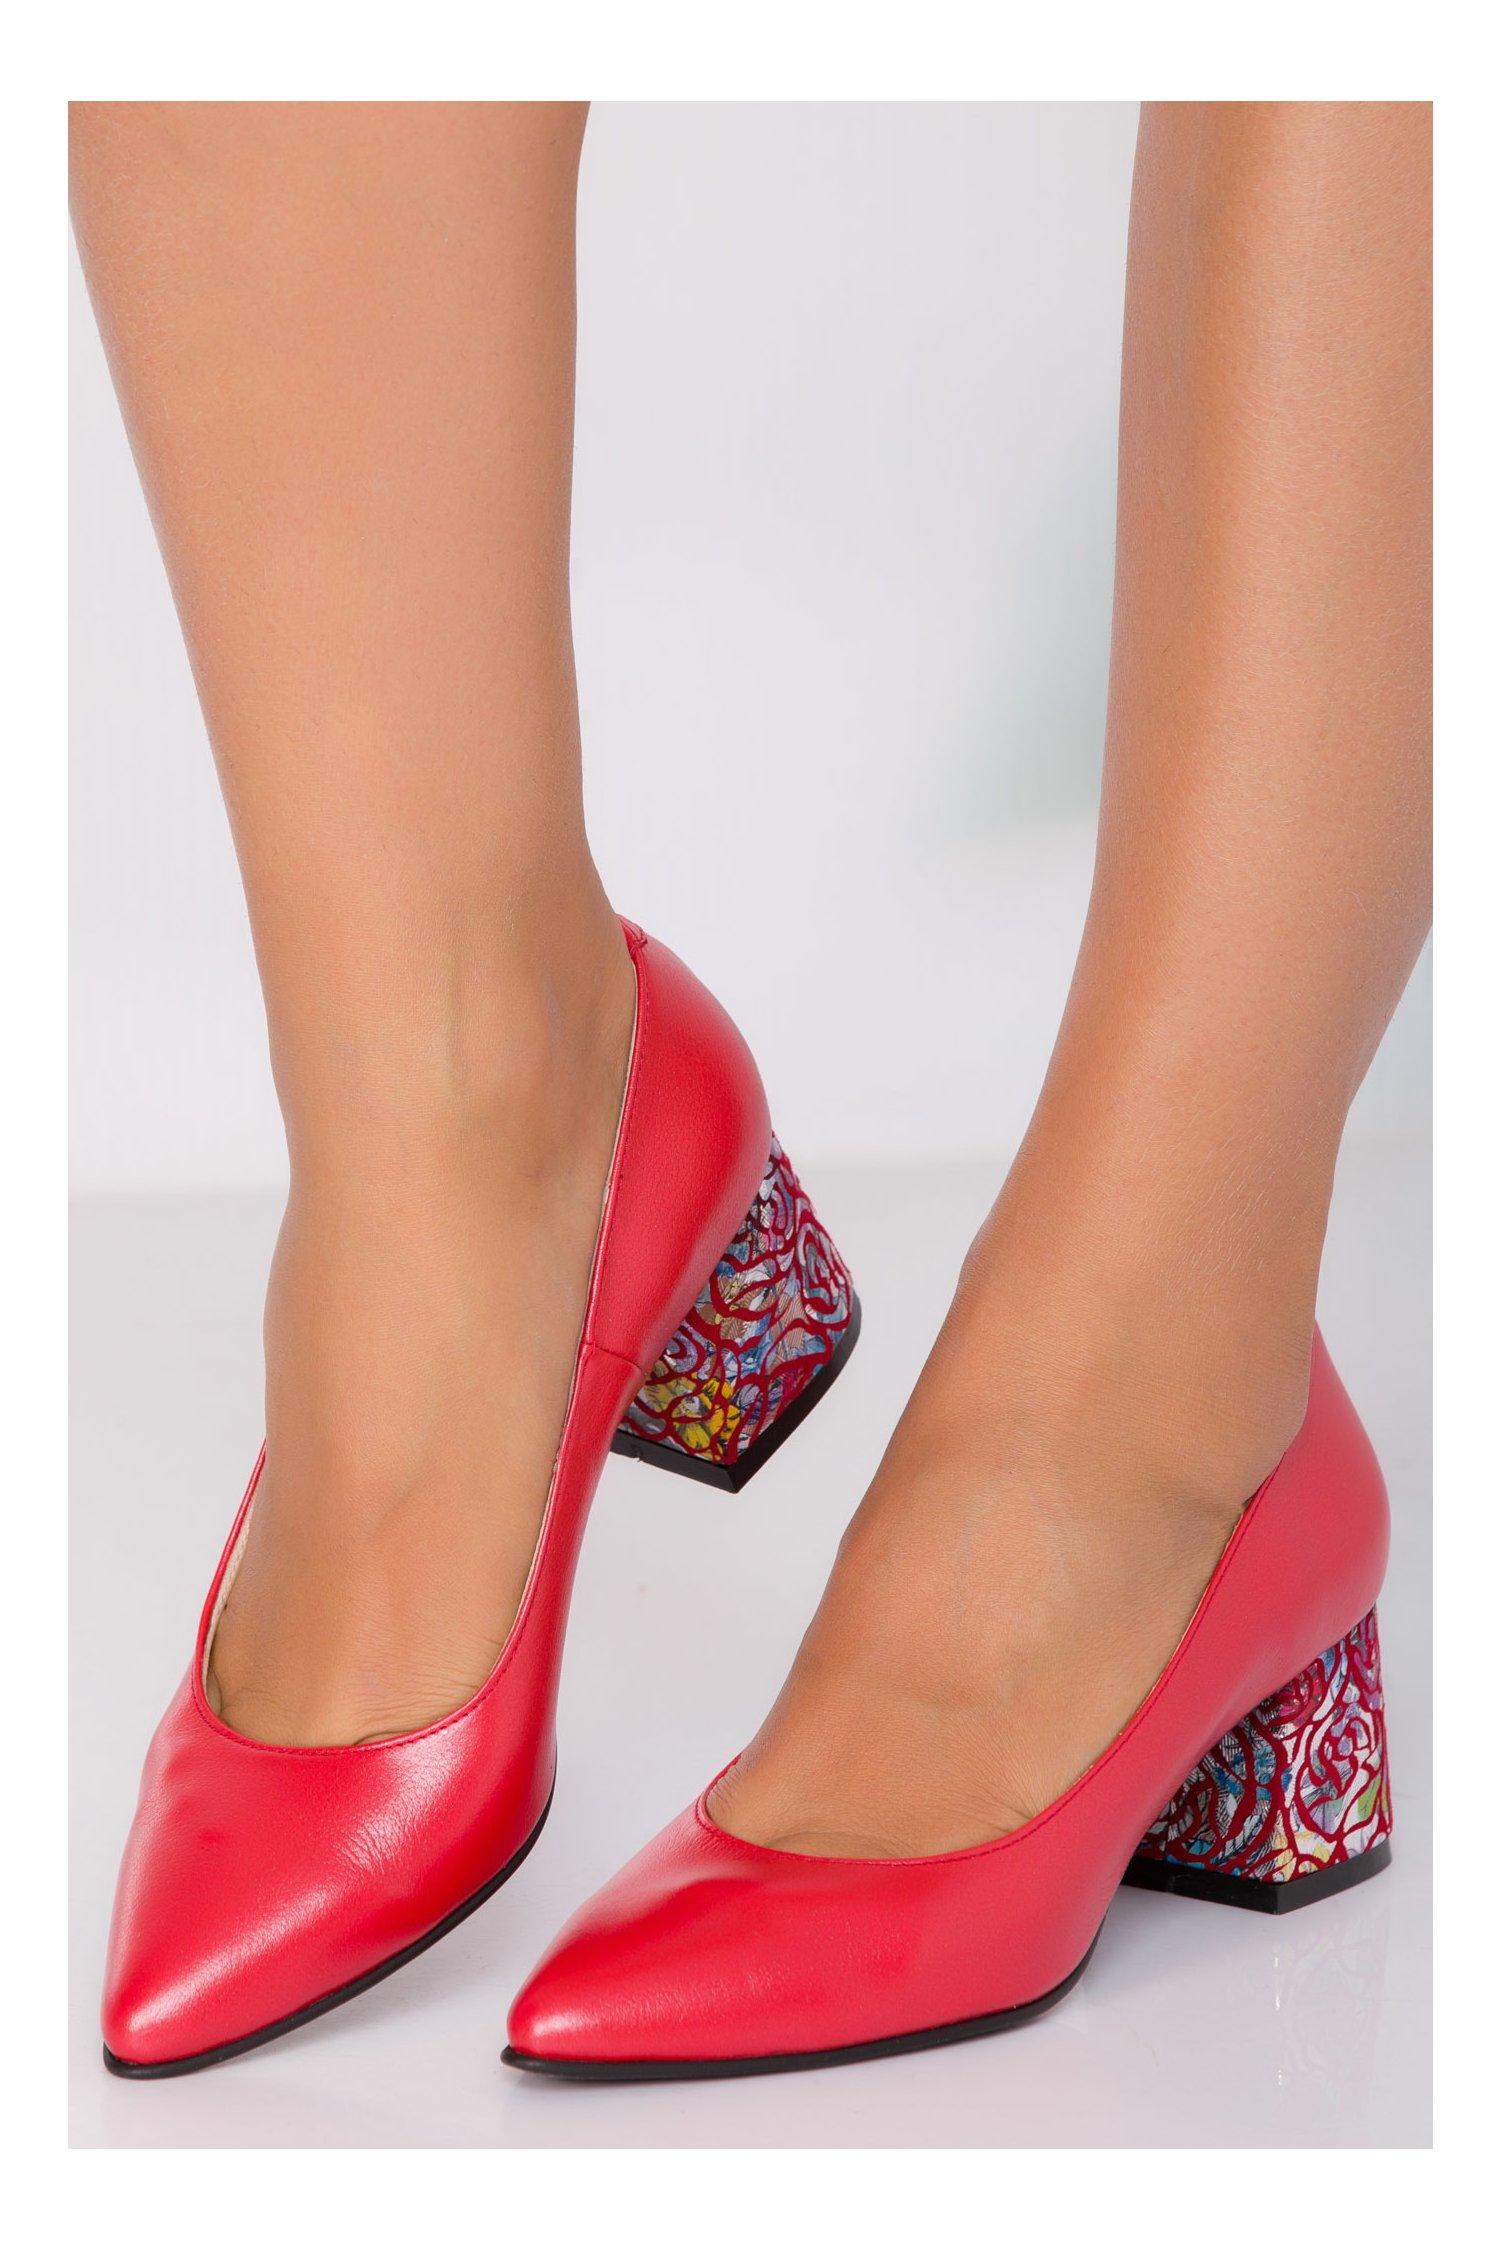 Pantofi Gina Rosii Cu Toc Imprimat